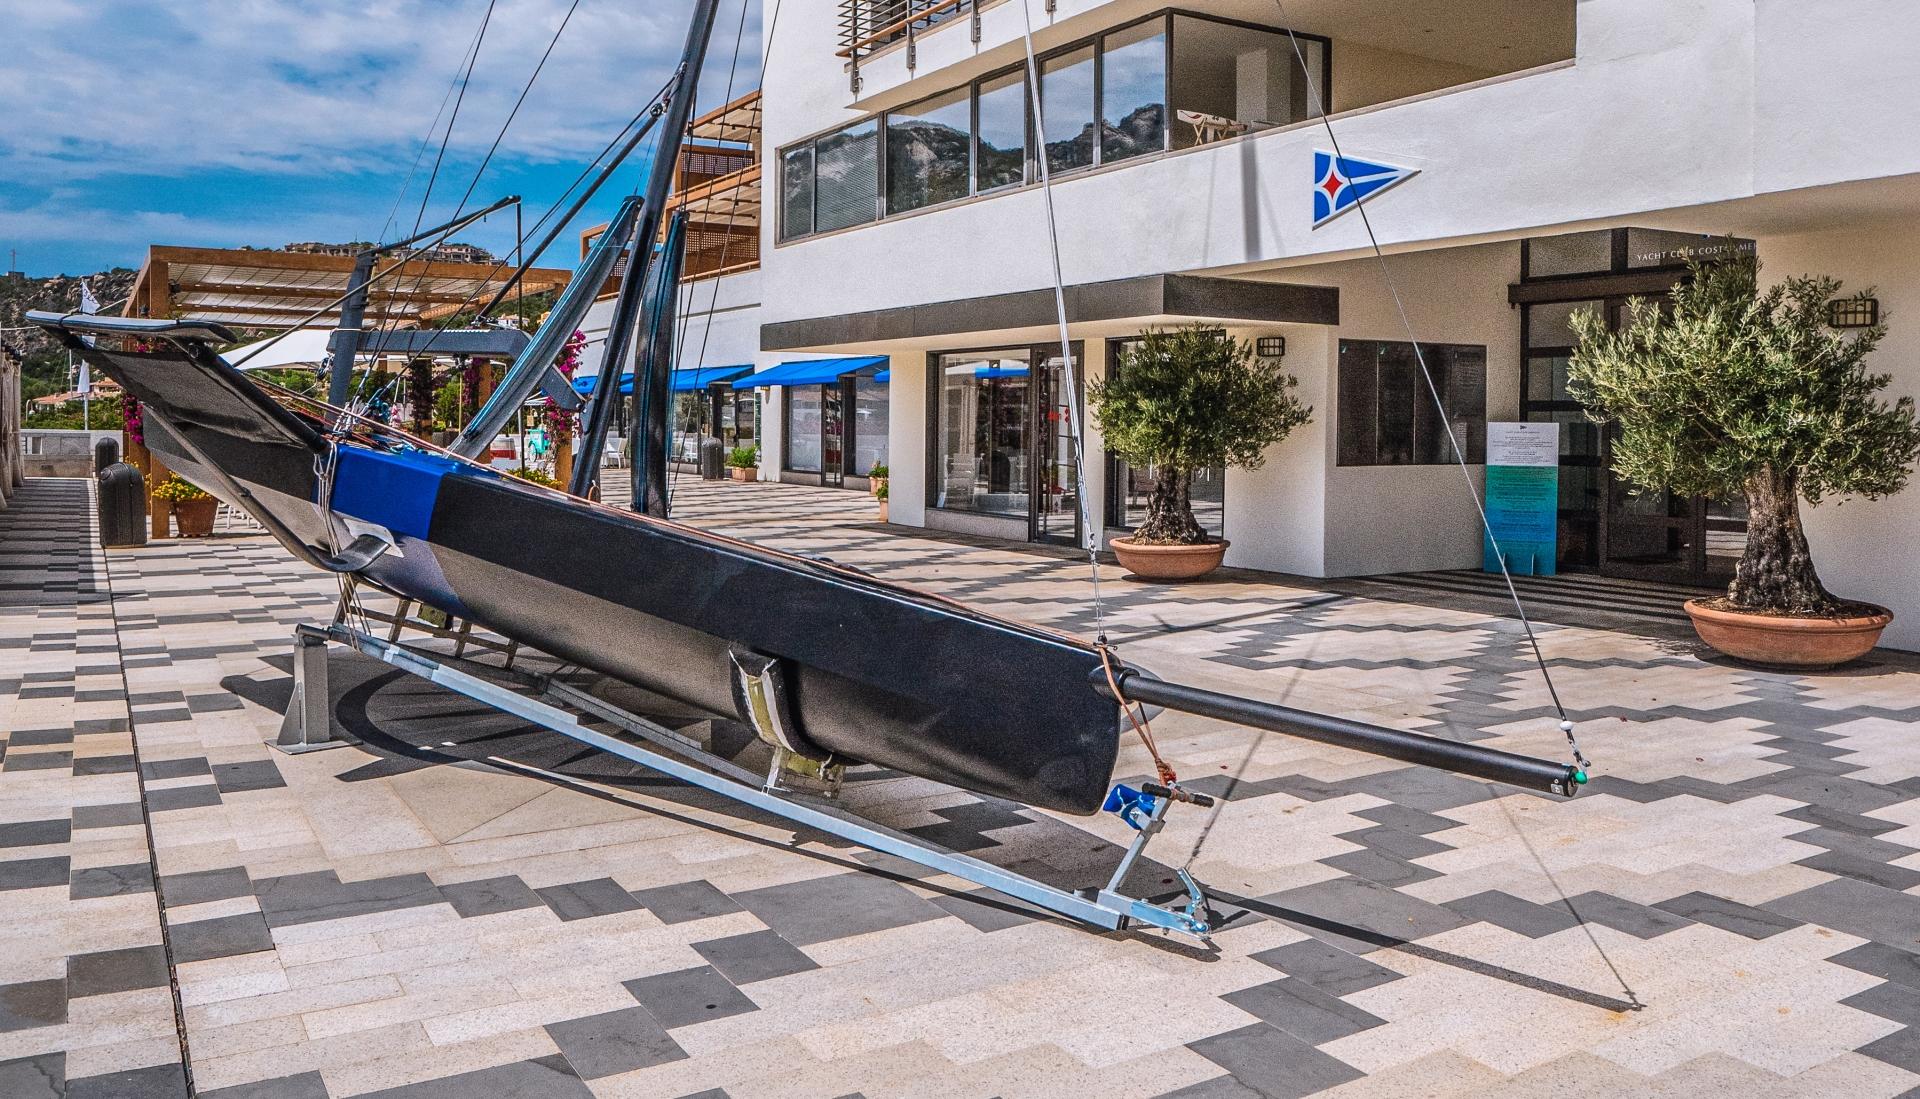 Young Azzurra alla Youth America's Cup - MEMBER NEWS - Yacht Club Costa Smeralda